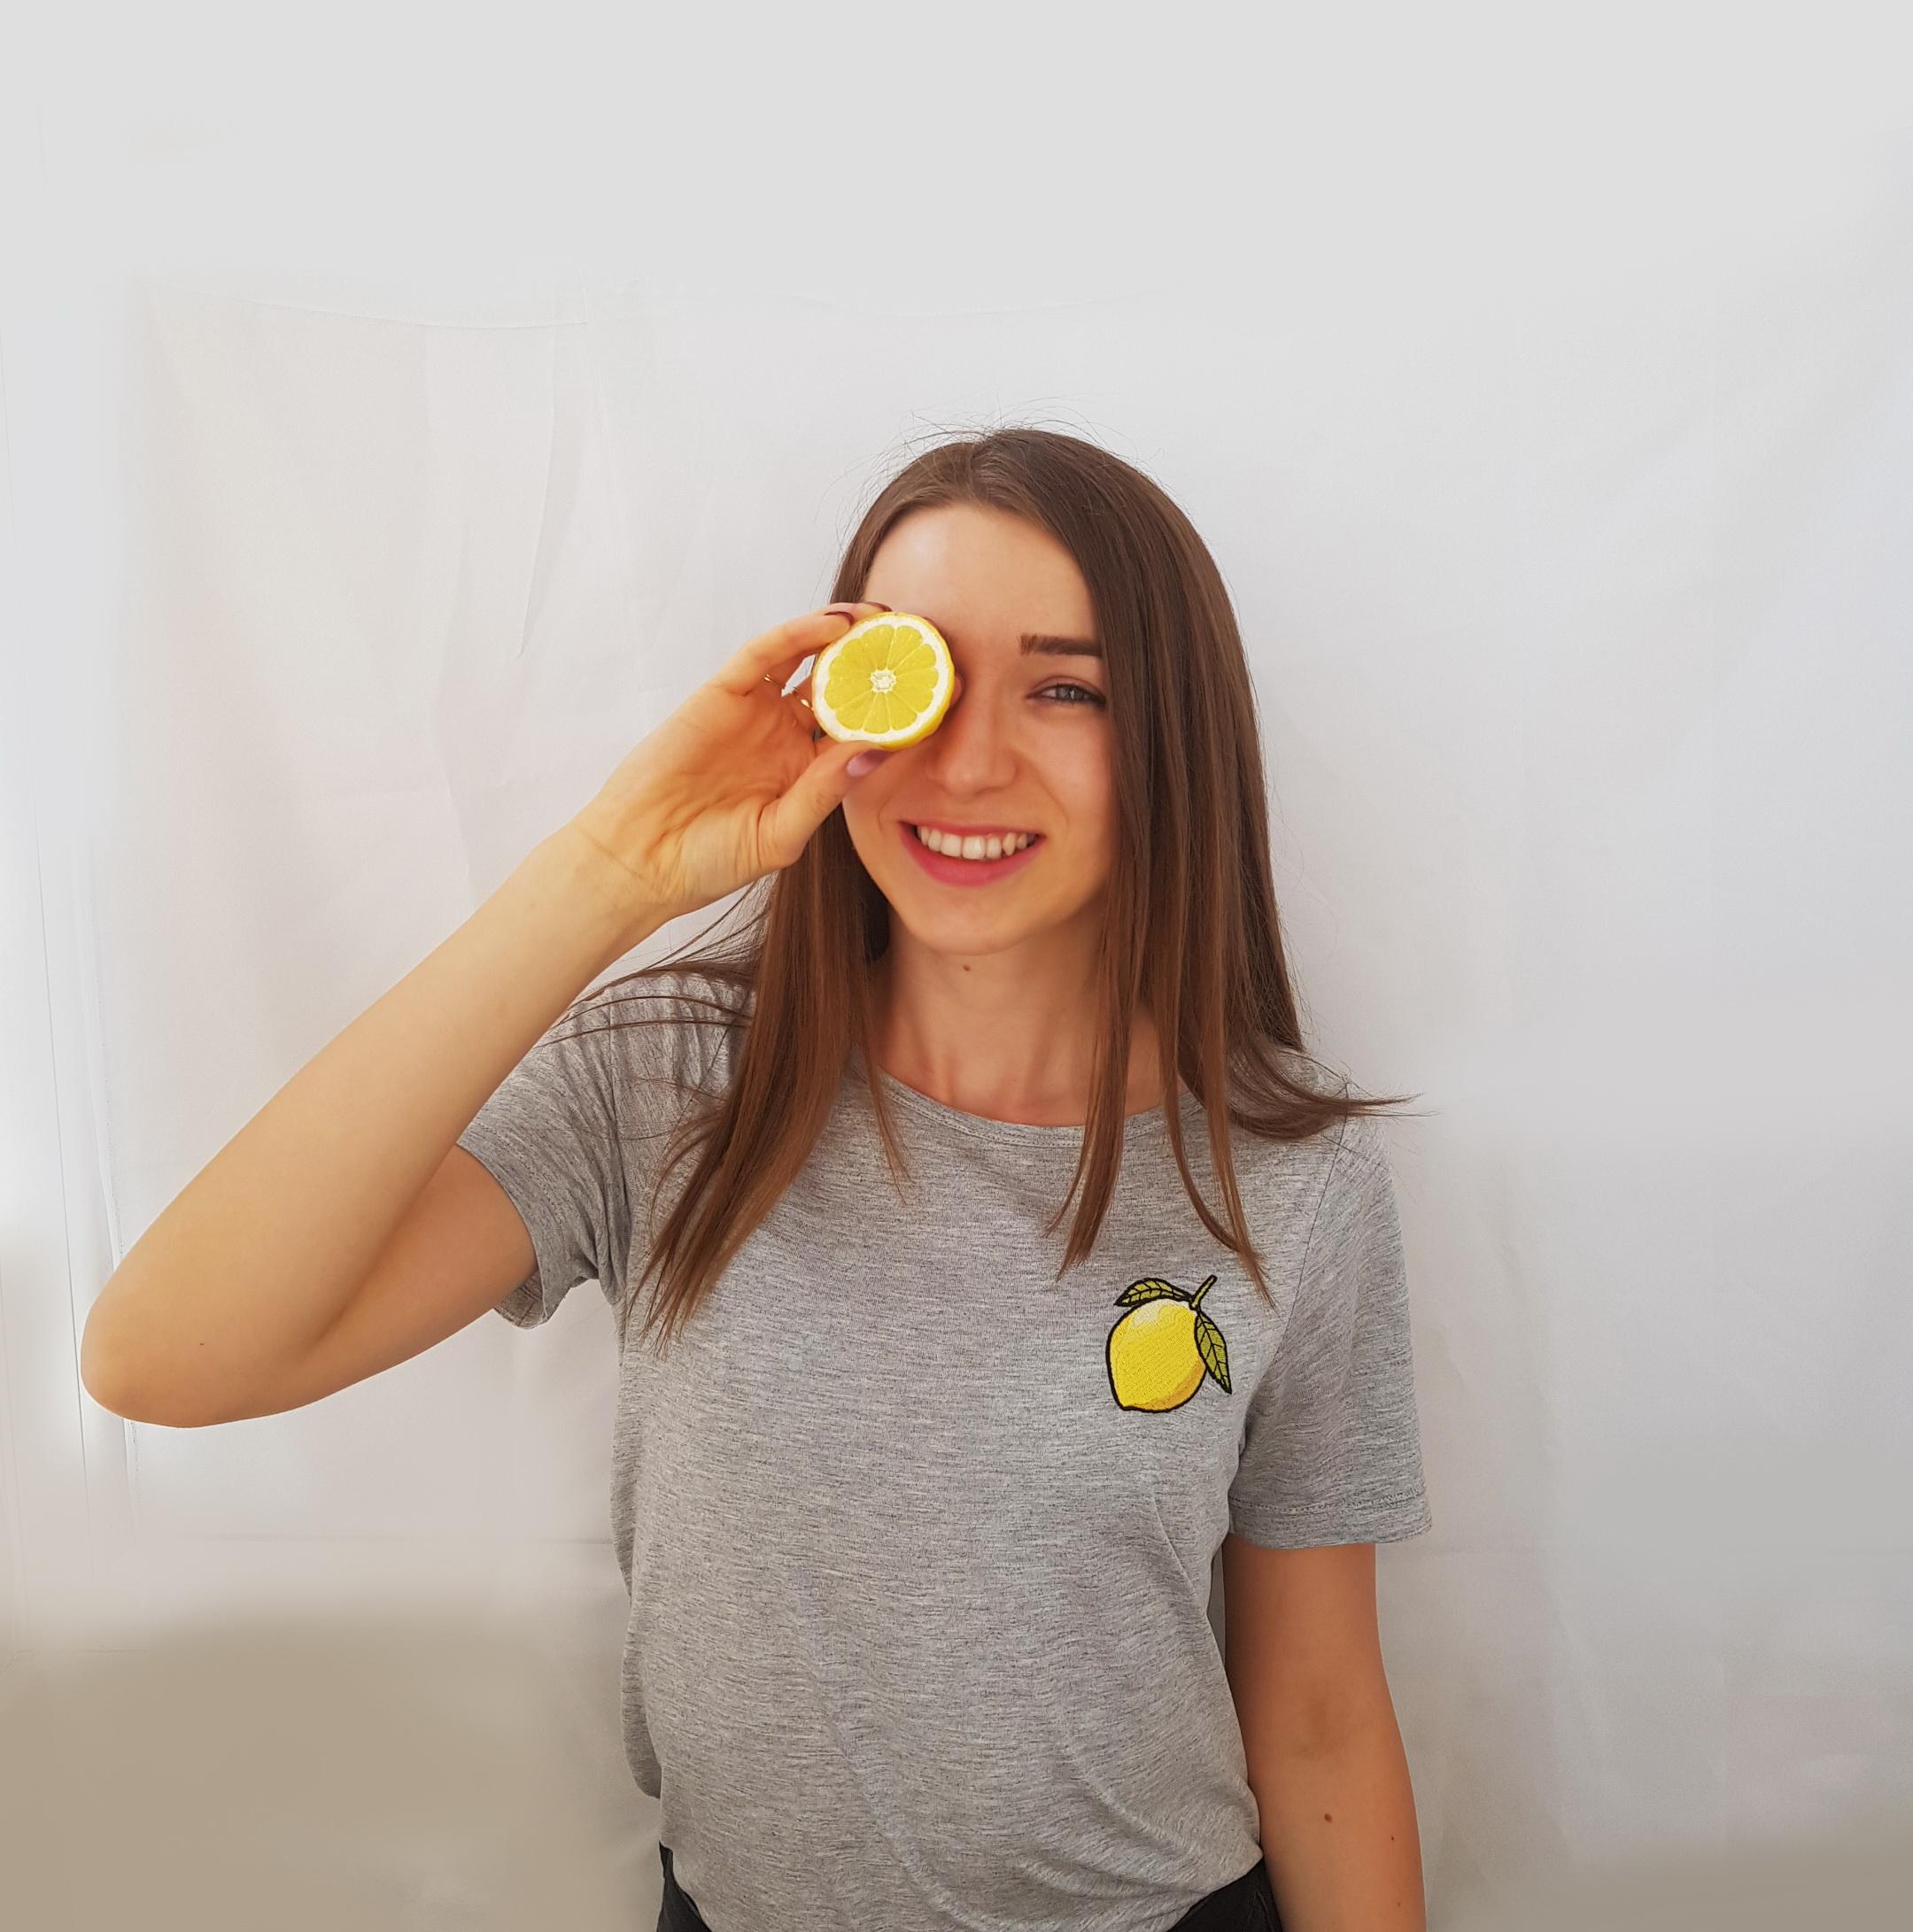 nicoleta - foodieopedia